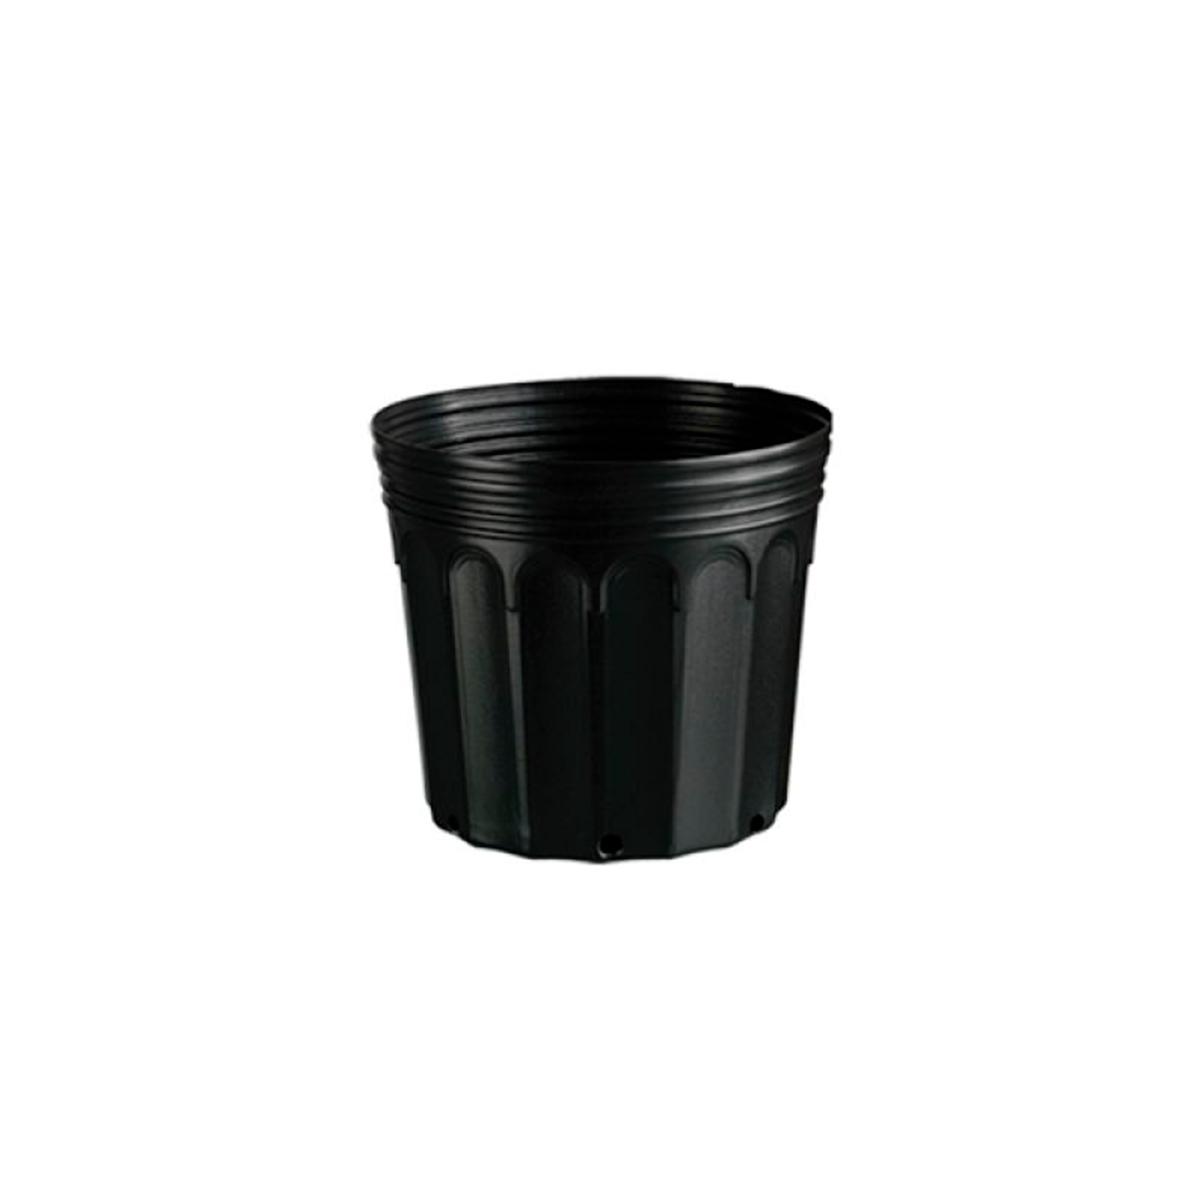 Kit 25 Embalagem Vaso para Mudas Plástico 3,6L